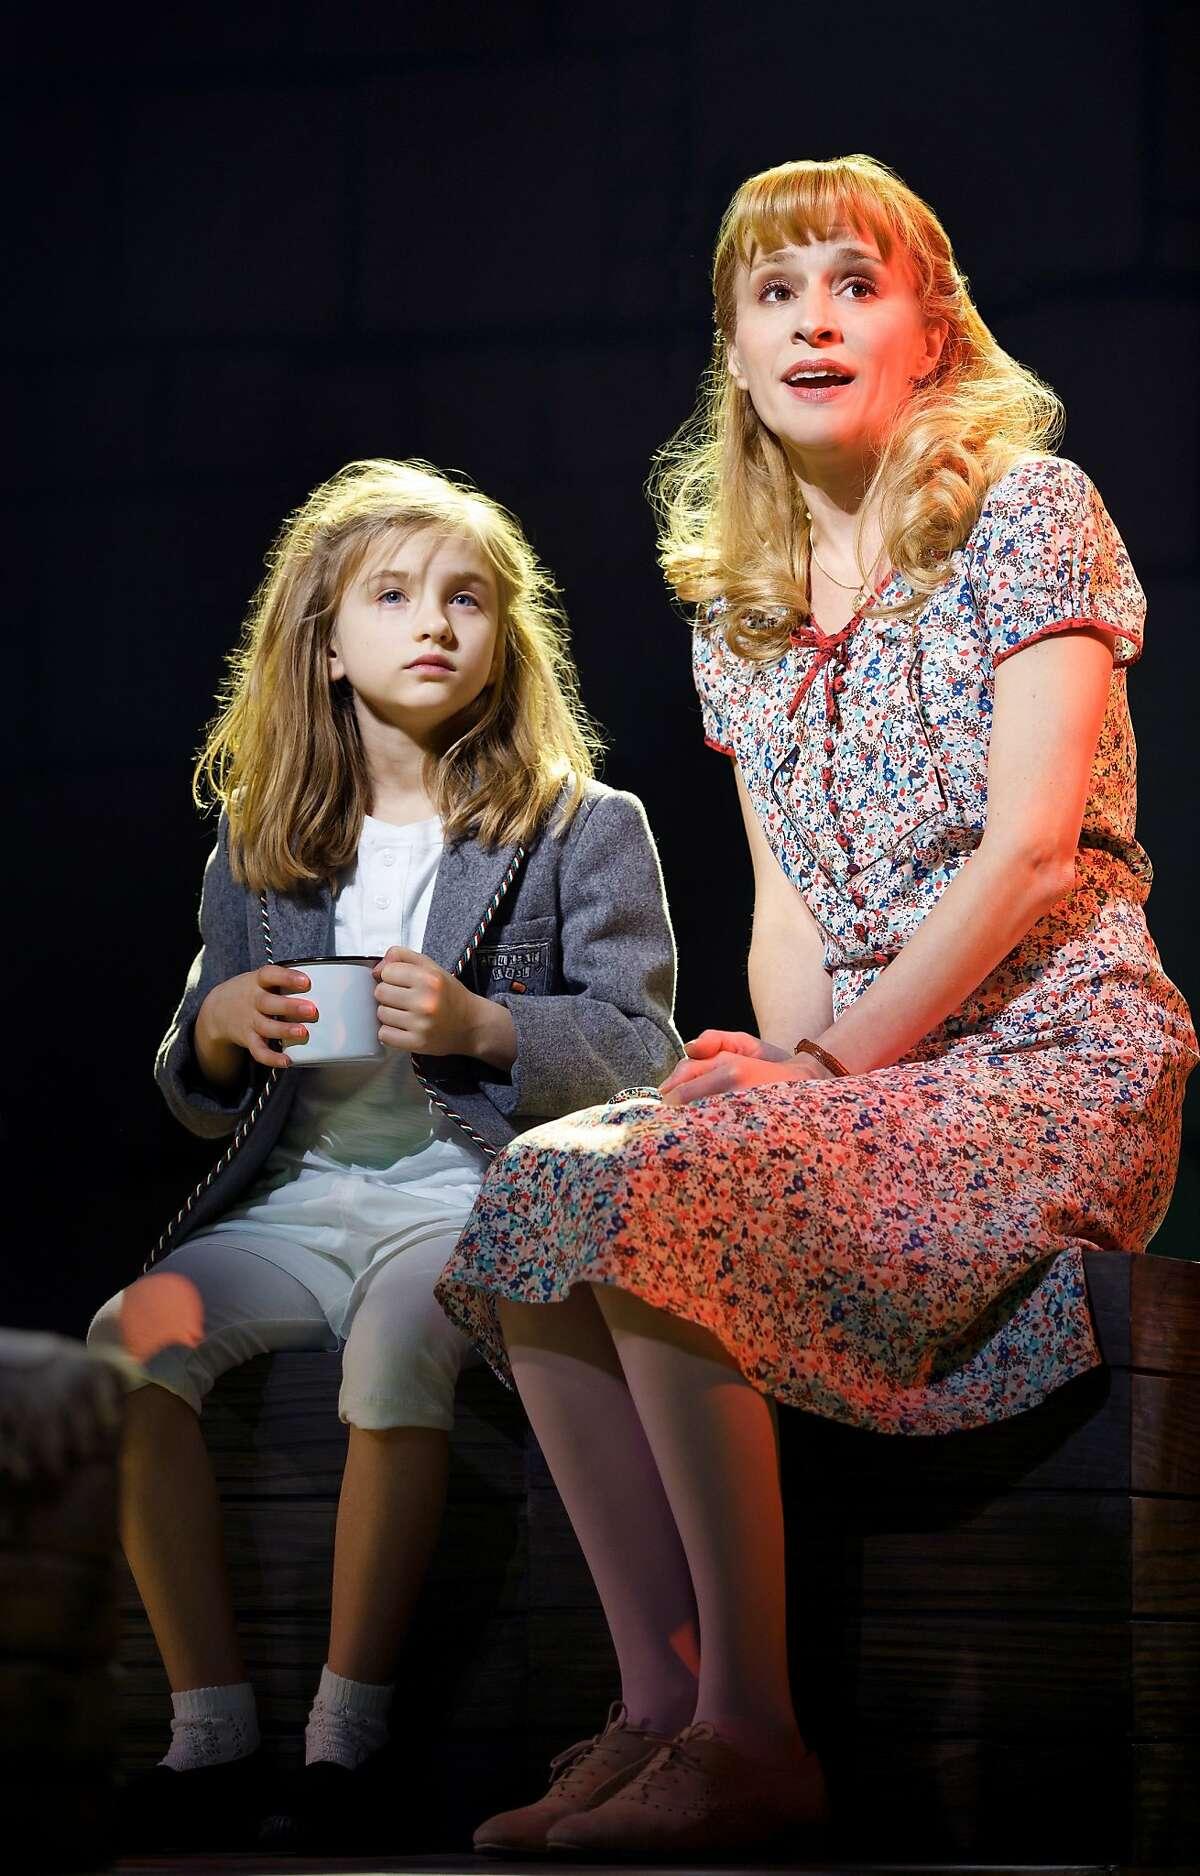 Matilda (Mabel Tyler) finds support with her teacher Miss Honey (Jennifer Blood) in